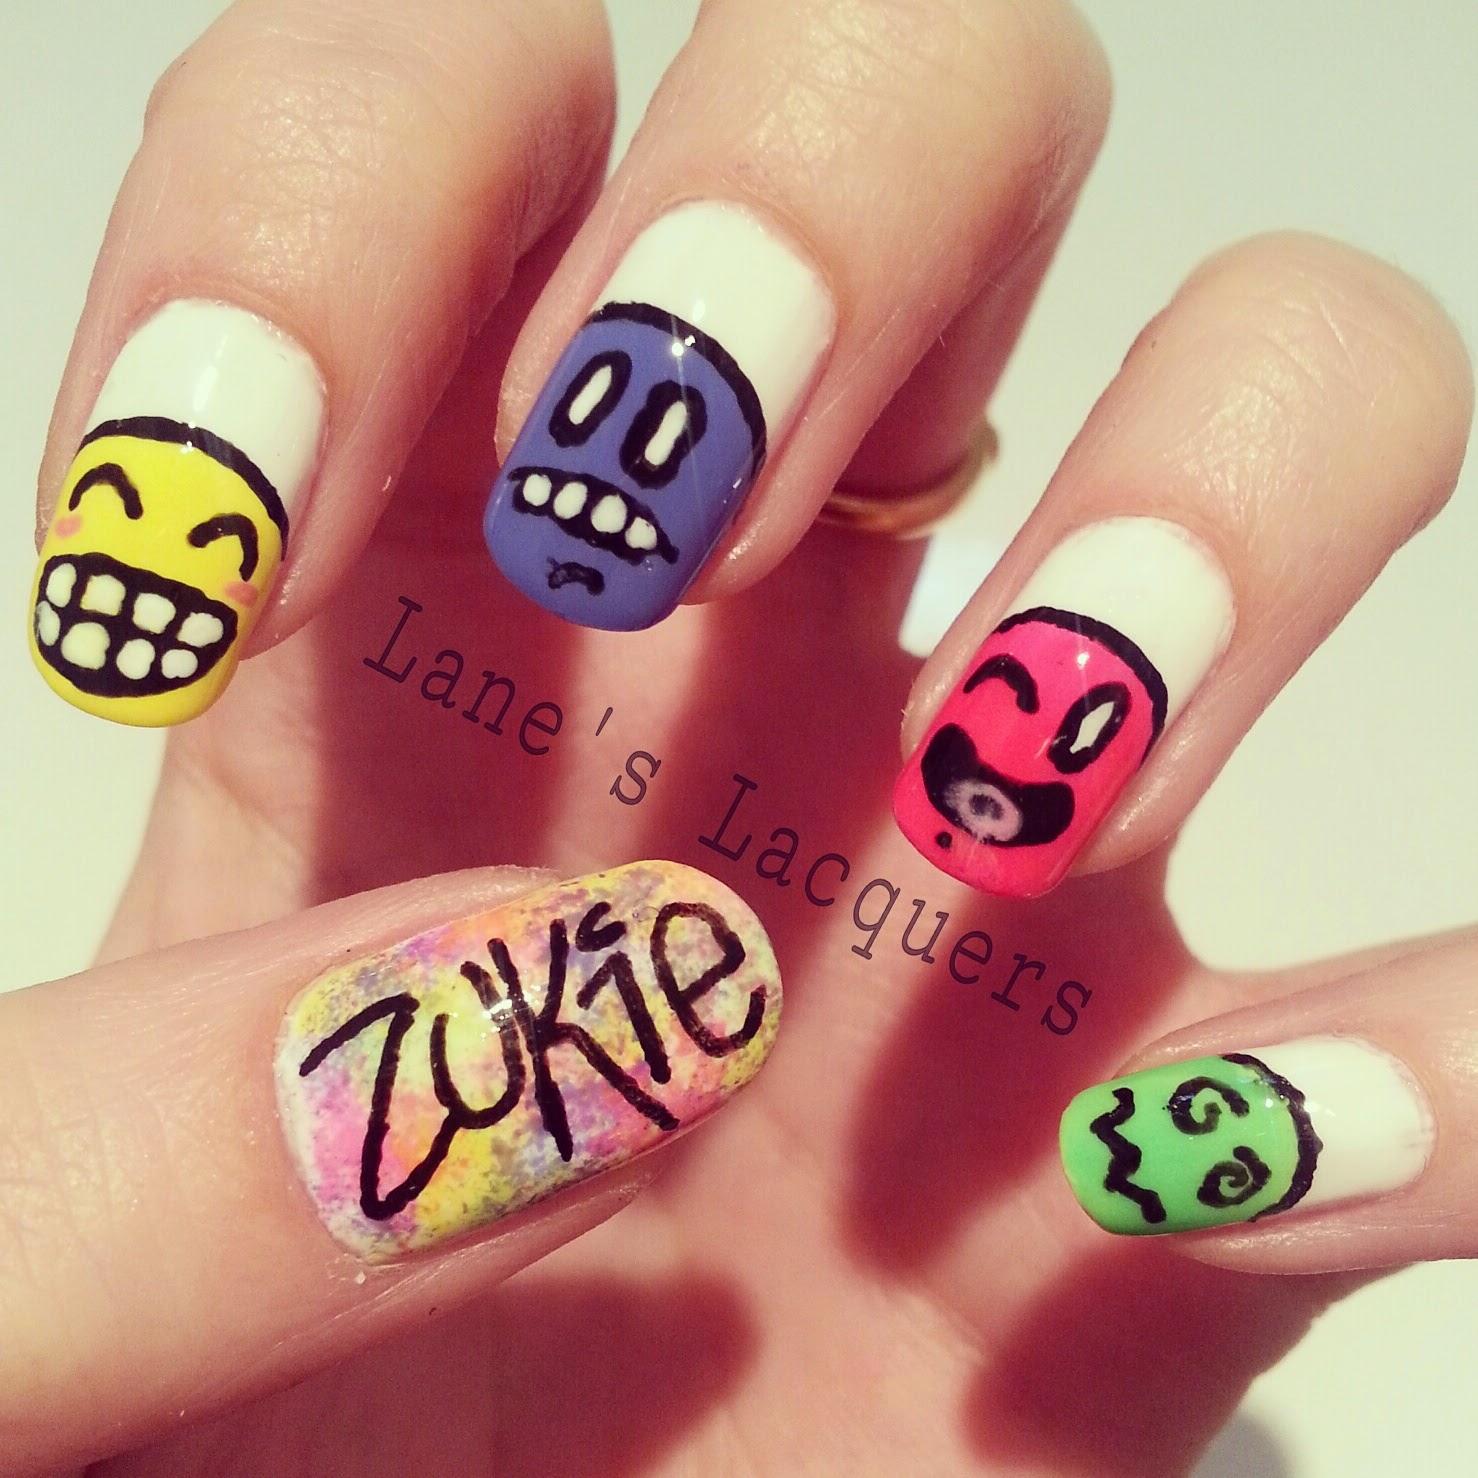 zukie-art-barry-m-freehand-nail-art